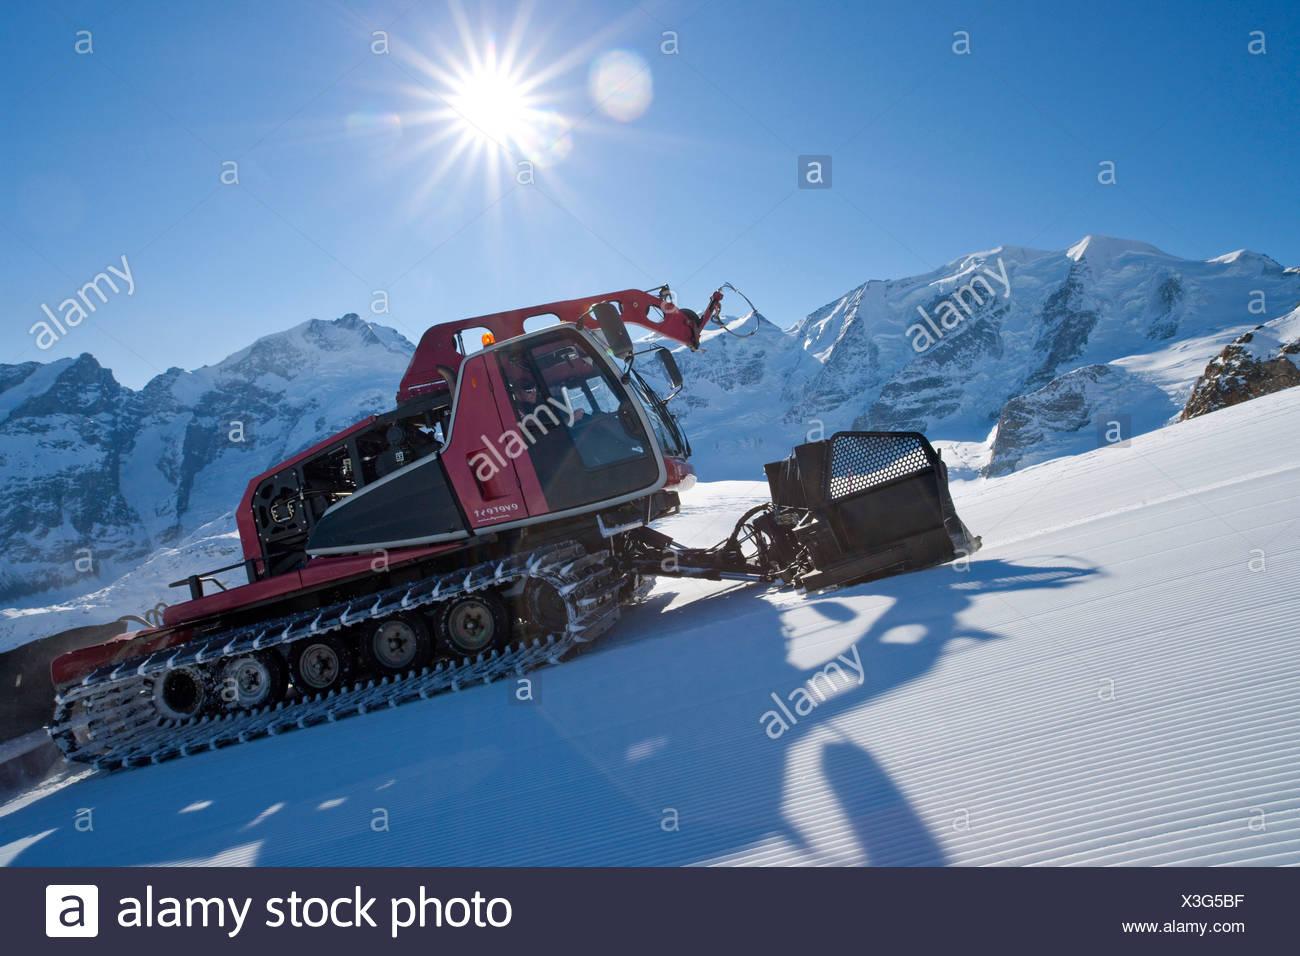 Piste, Fahrzeug, Schnee Goomer, Diavolezza, anzeigen, Bernina, Wintersport, Kanton Graubünden, Graubünden, Engadin, Engadin, GR, Obere Stockbild